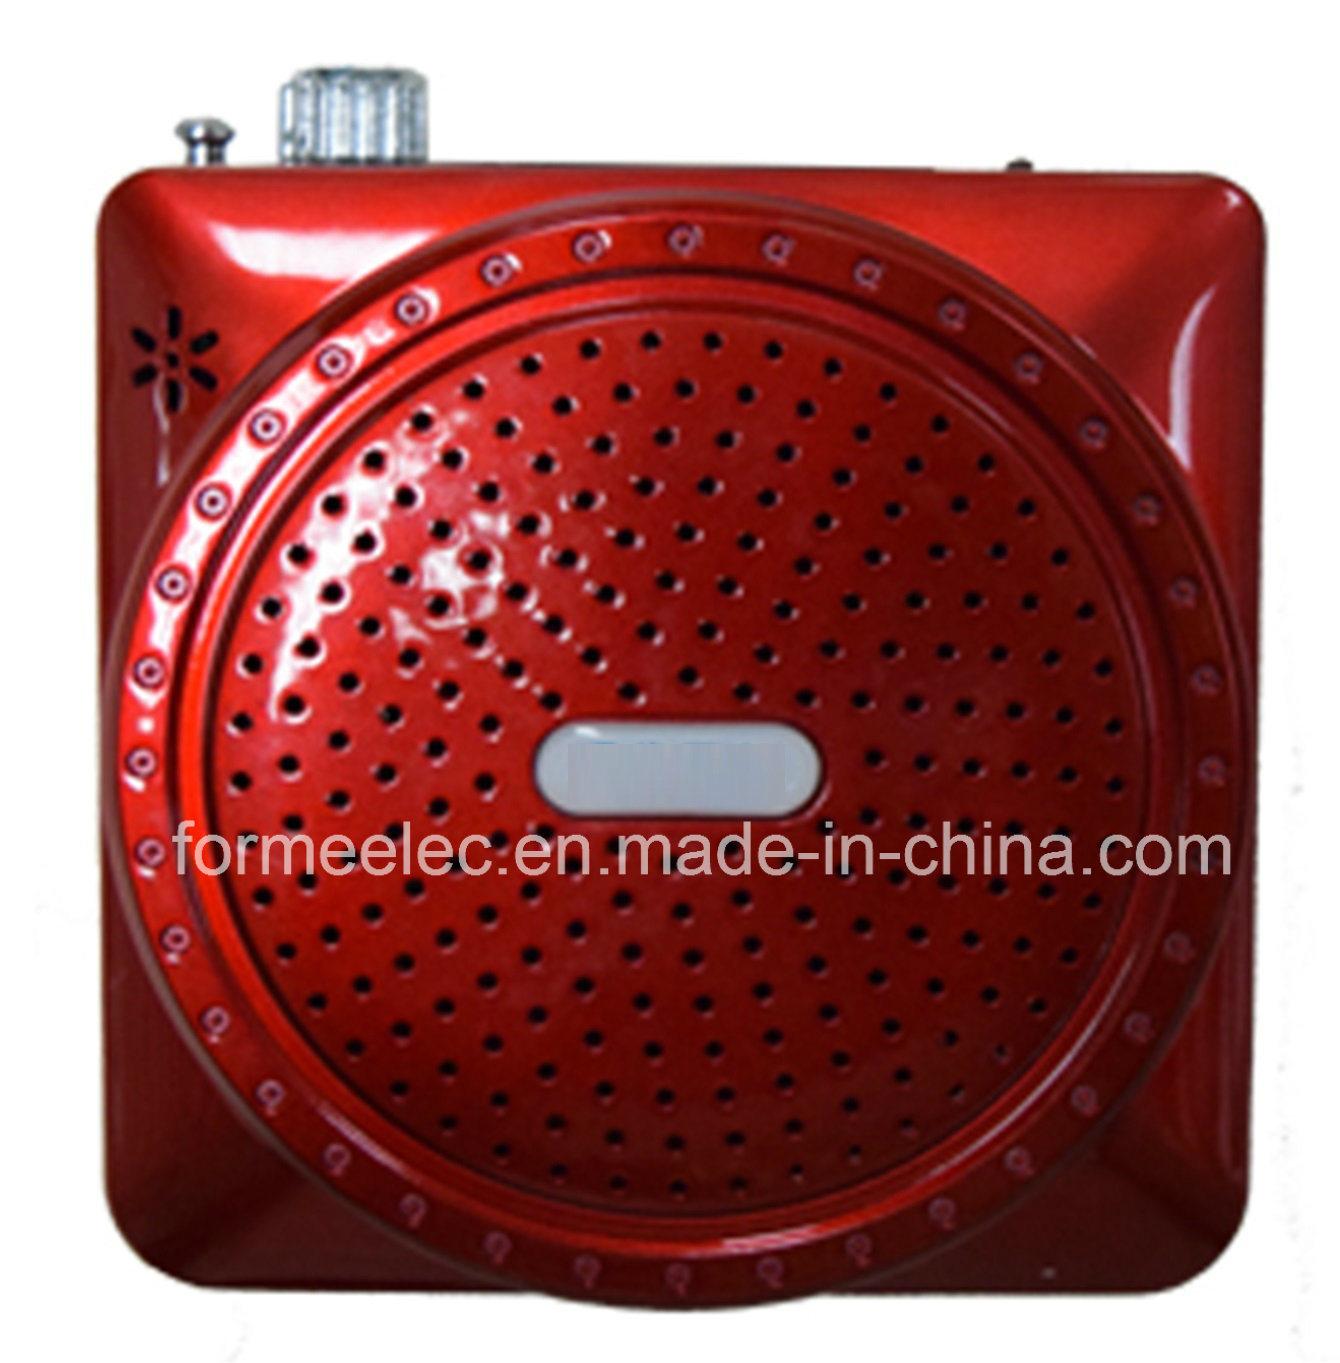 Portable Speaker FM Radio USB TF MP3 Player